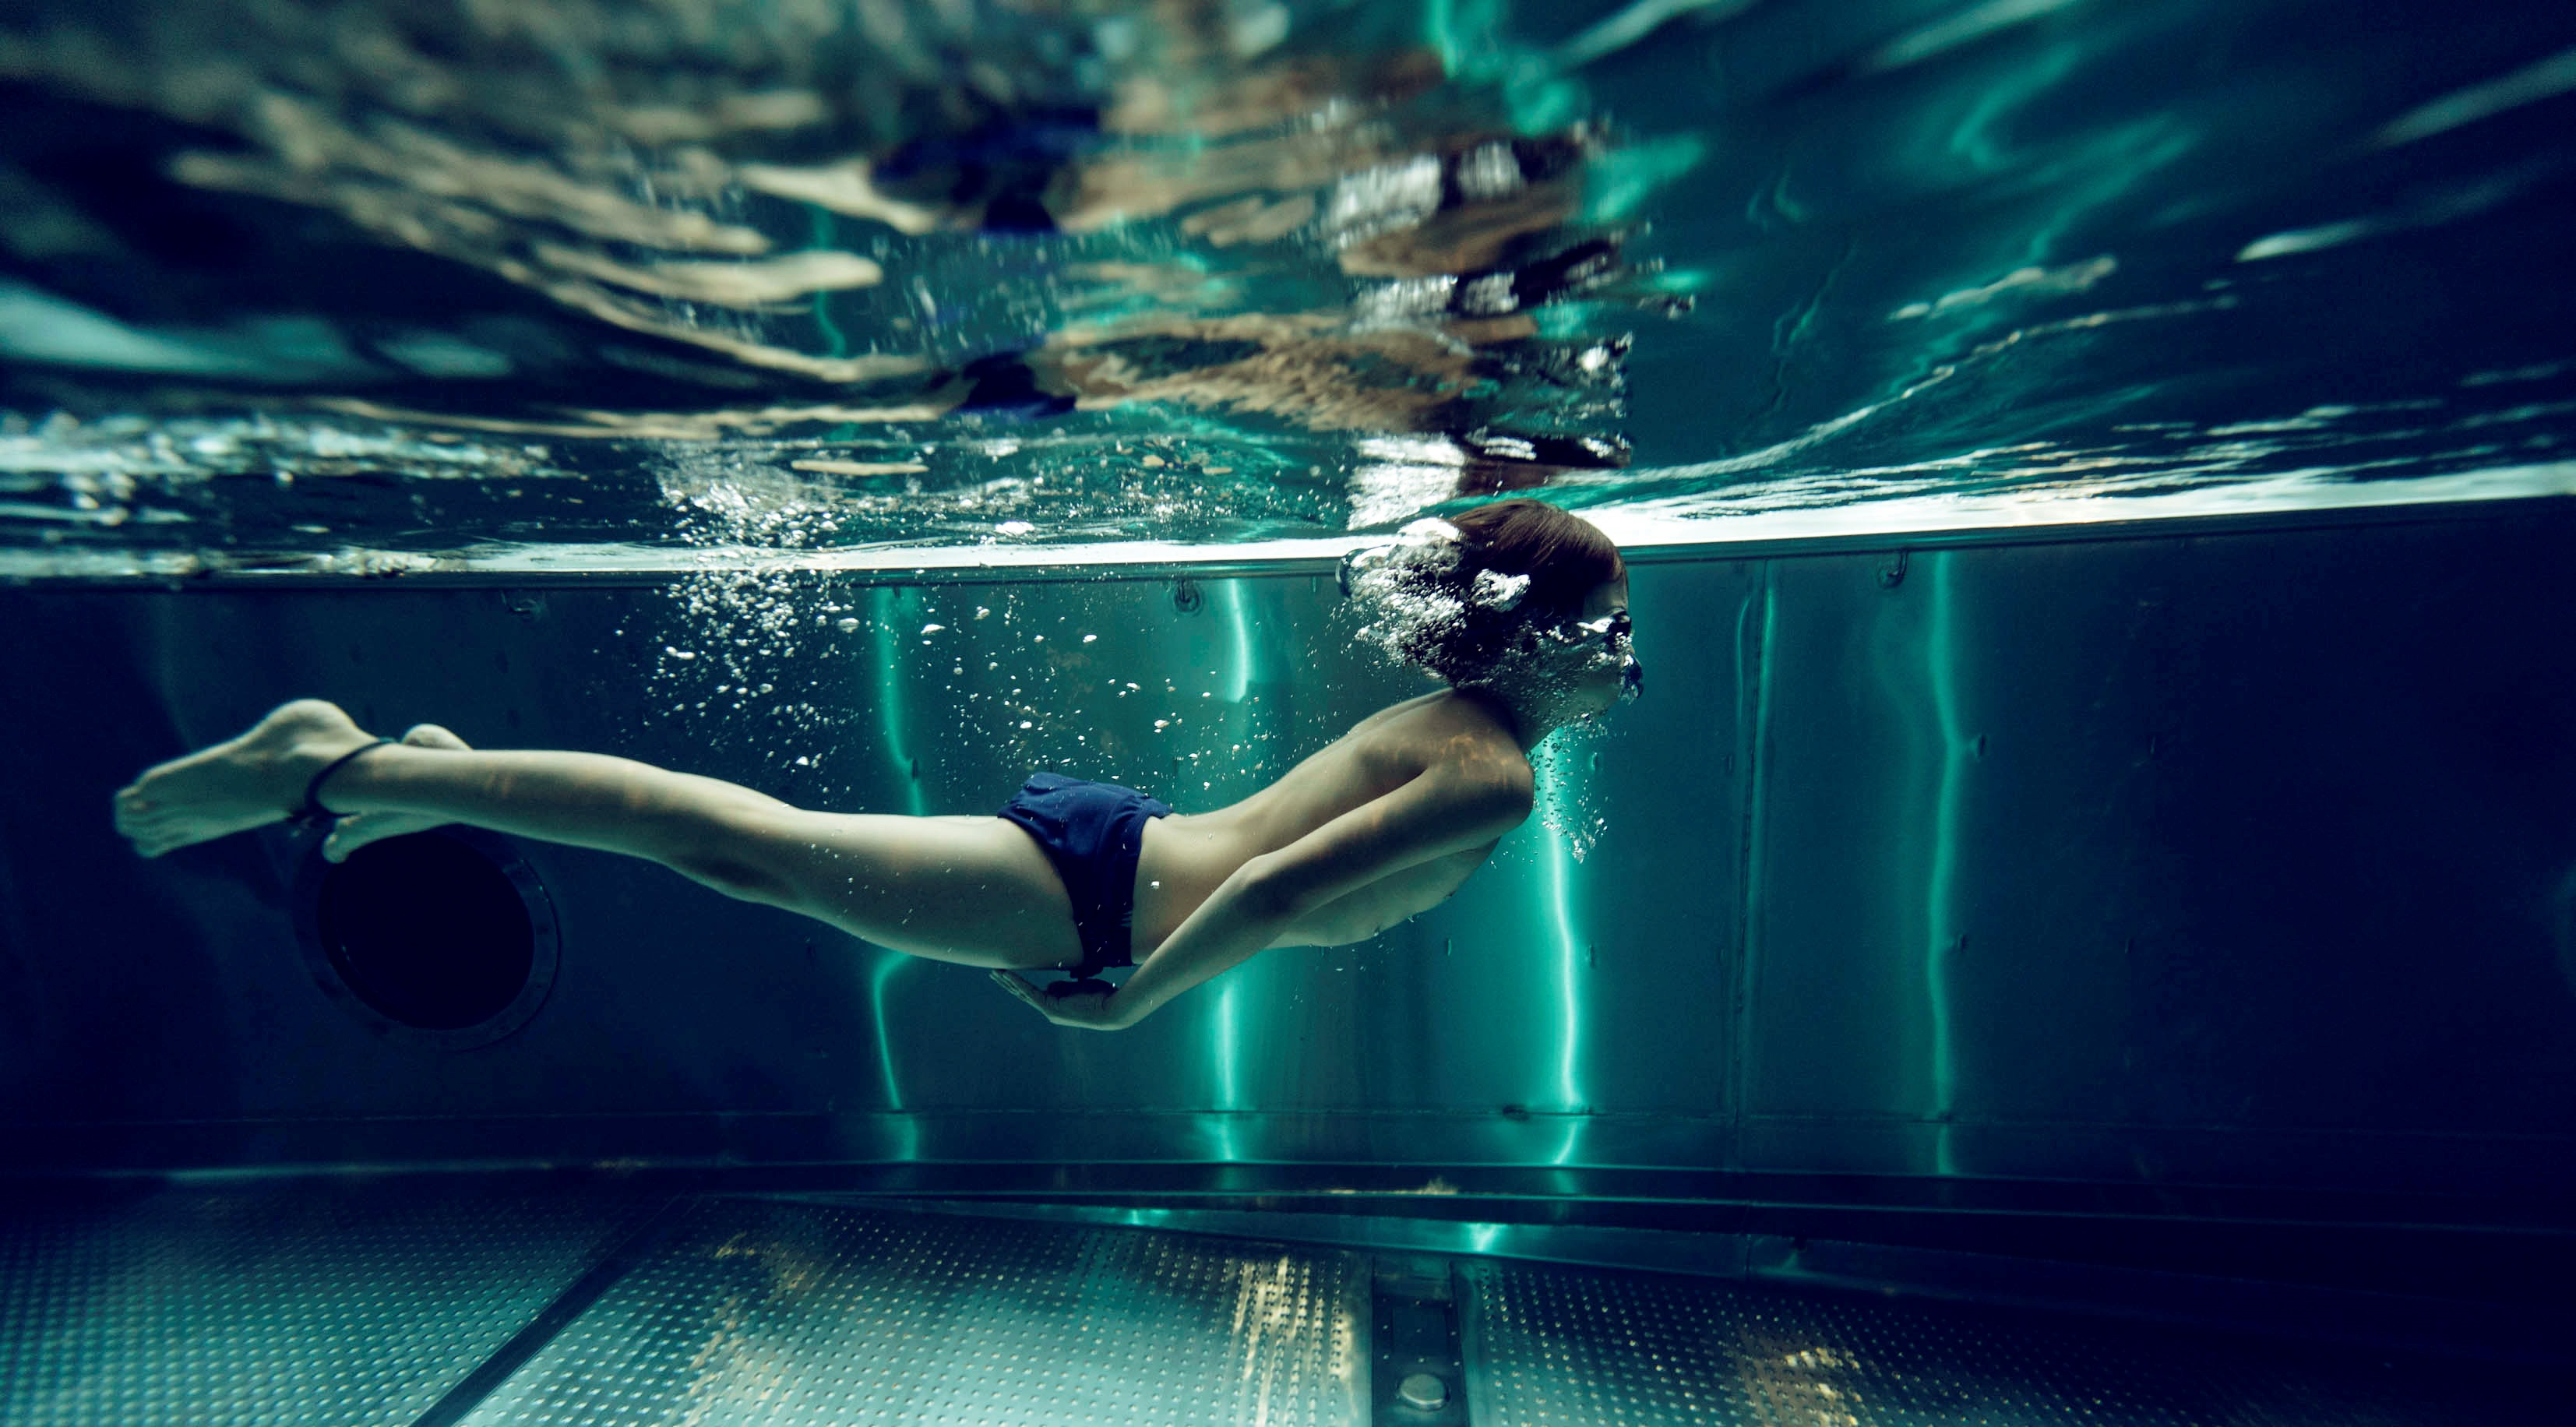 Caverion Junge im Schwimmbad